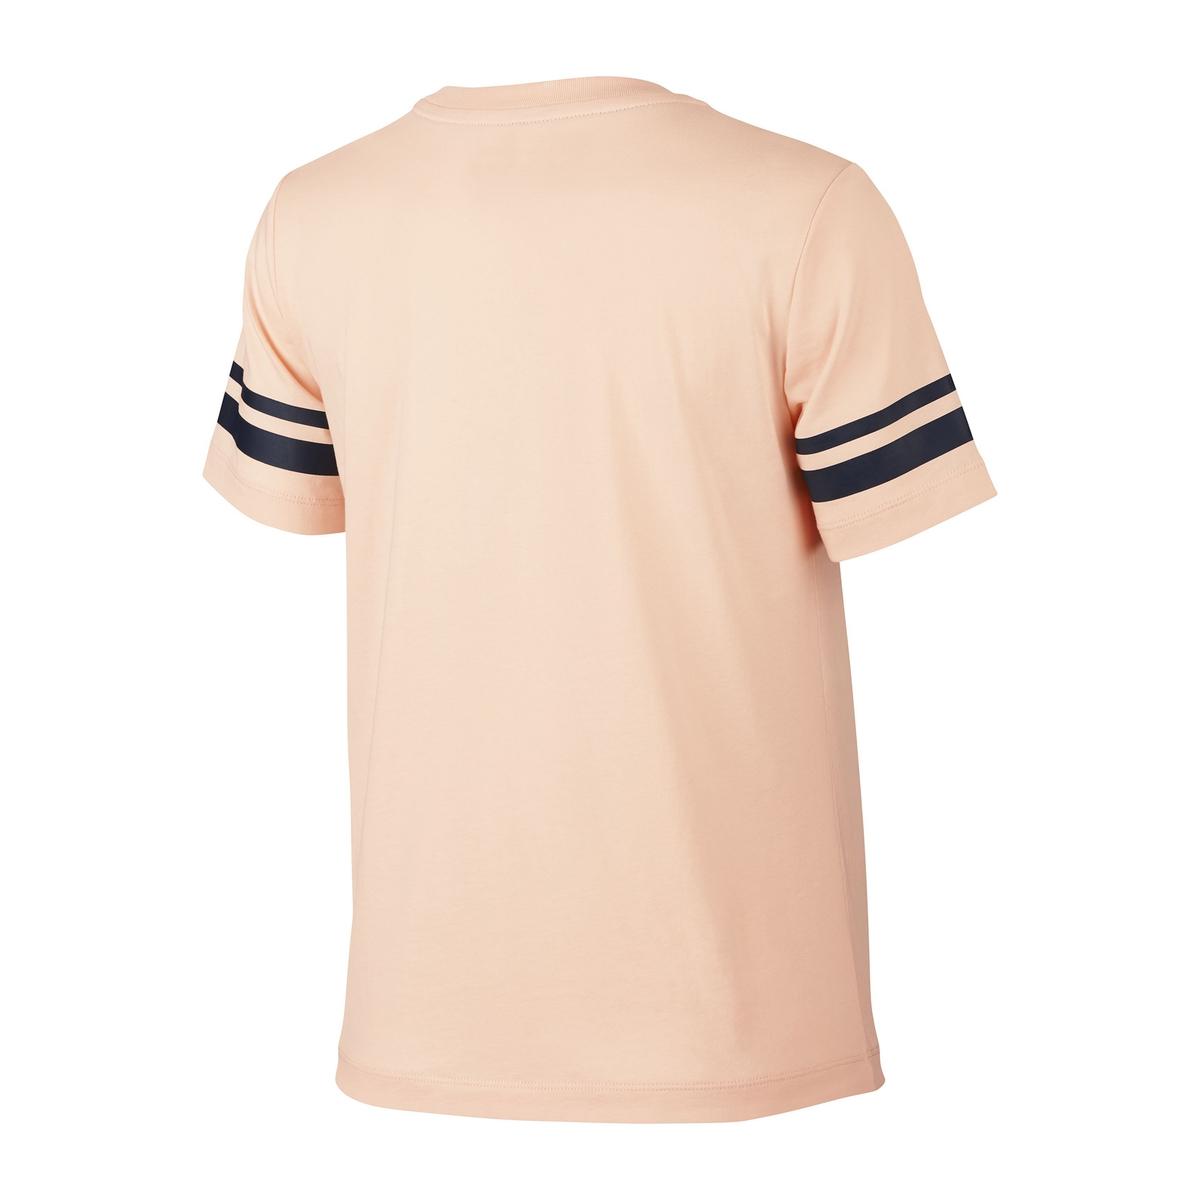 Imagen secundaria de producto de Camiseta Sportswear AR3769-664 - Nike